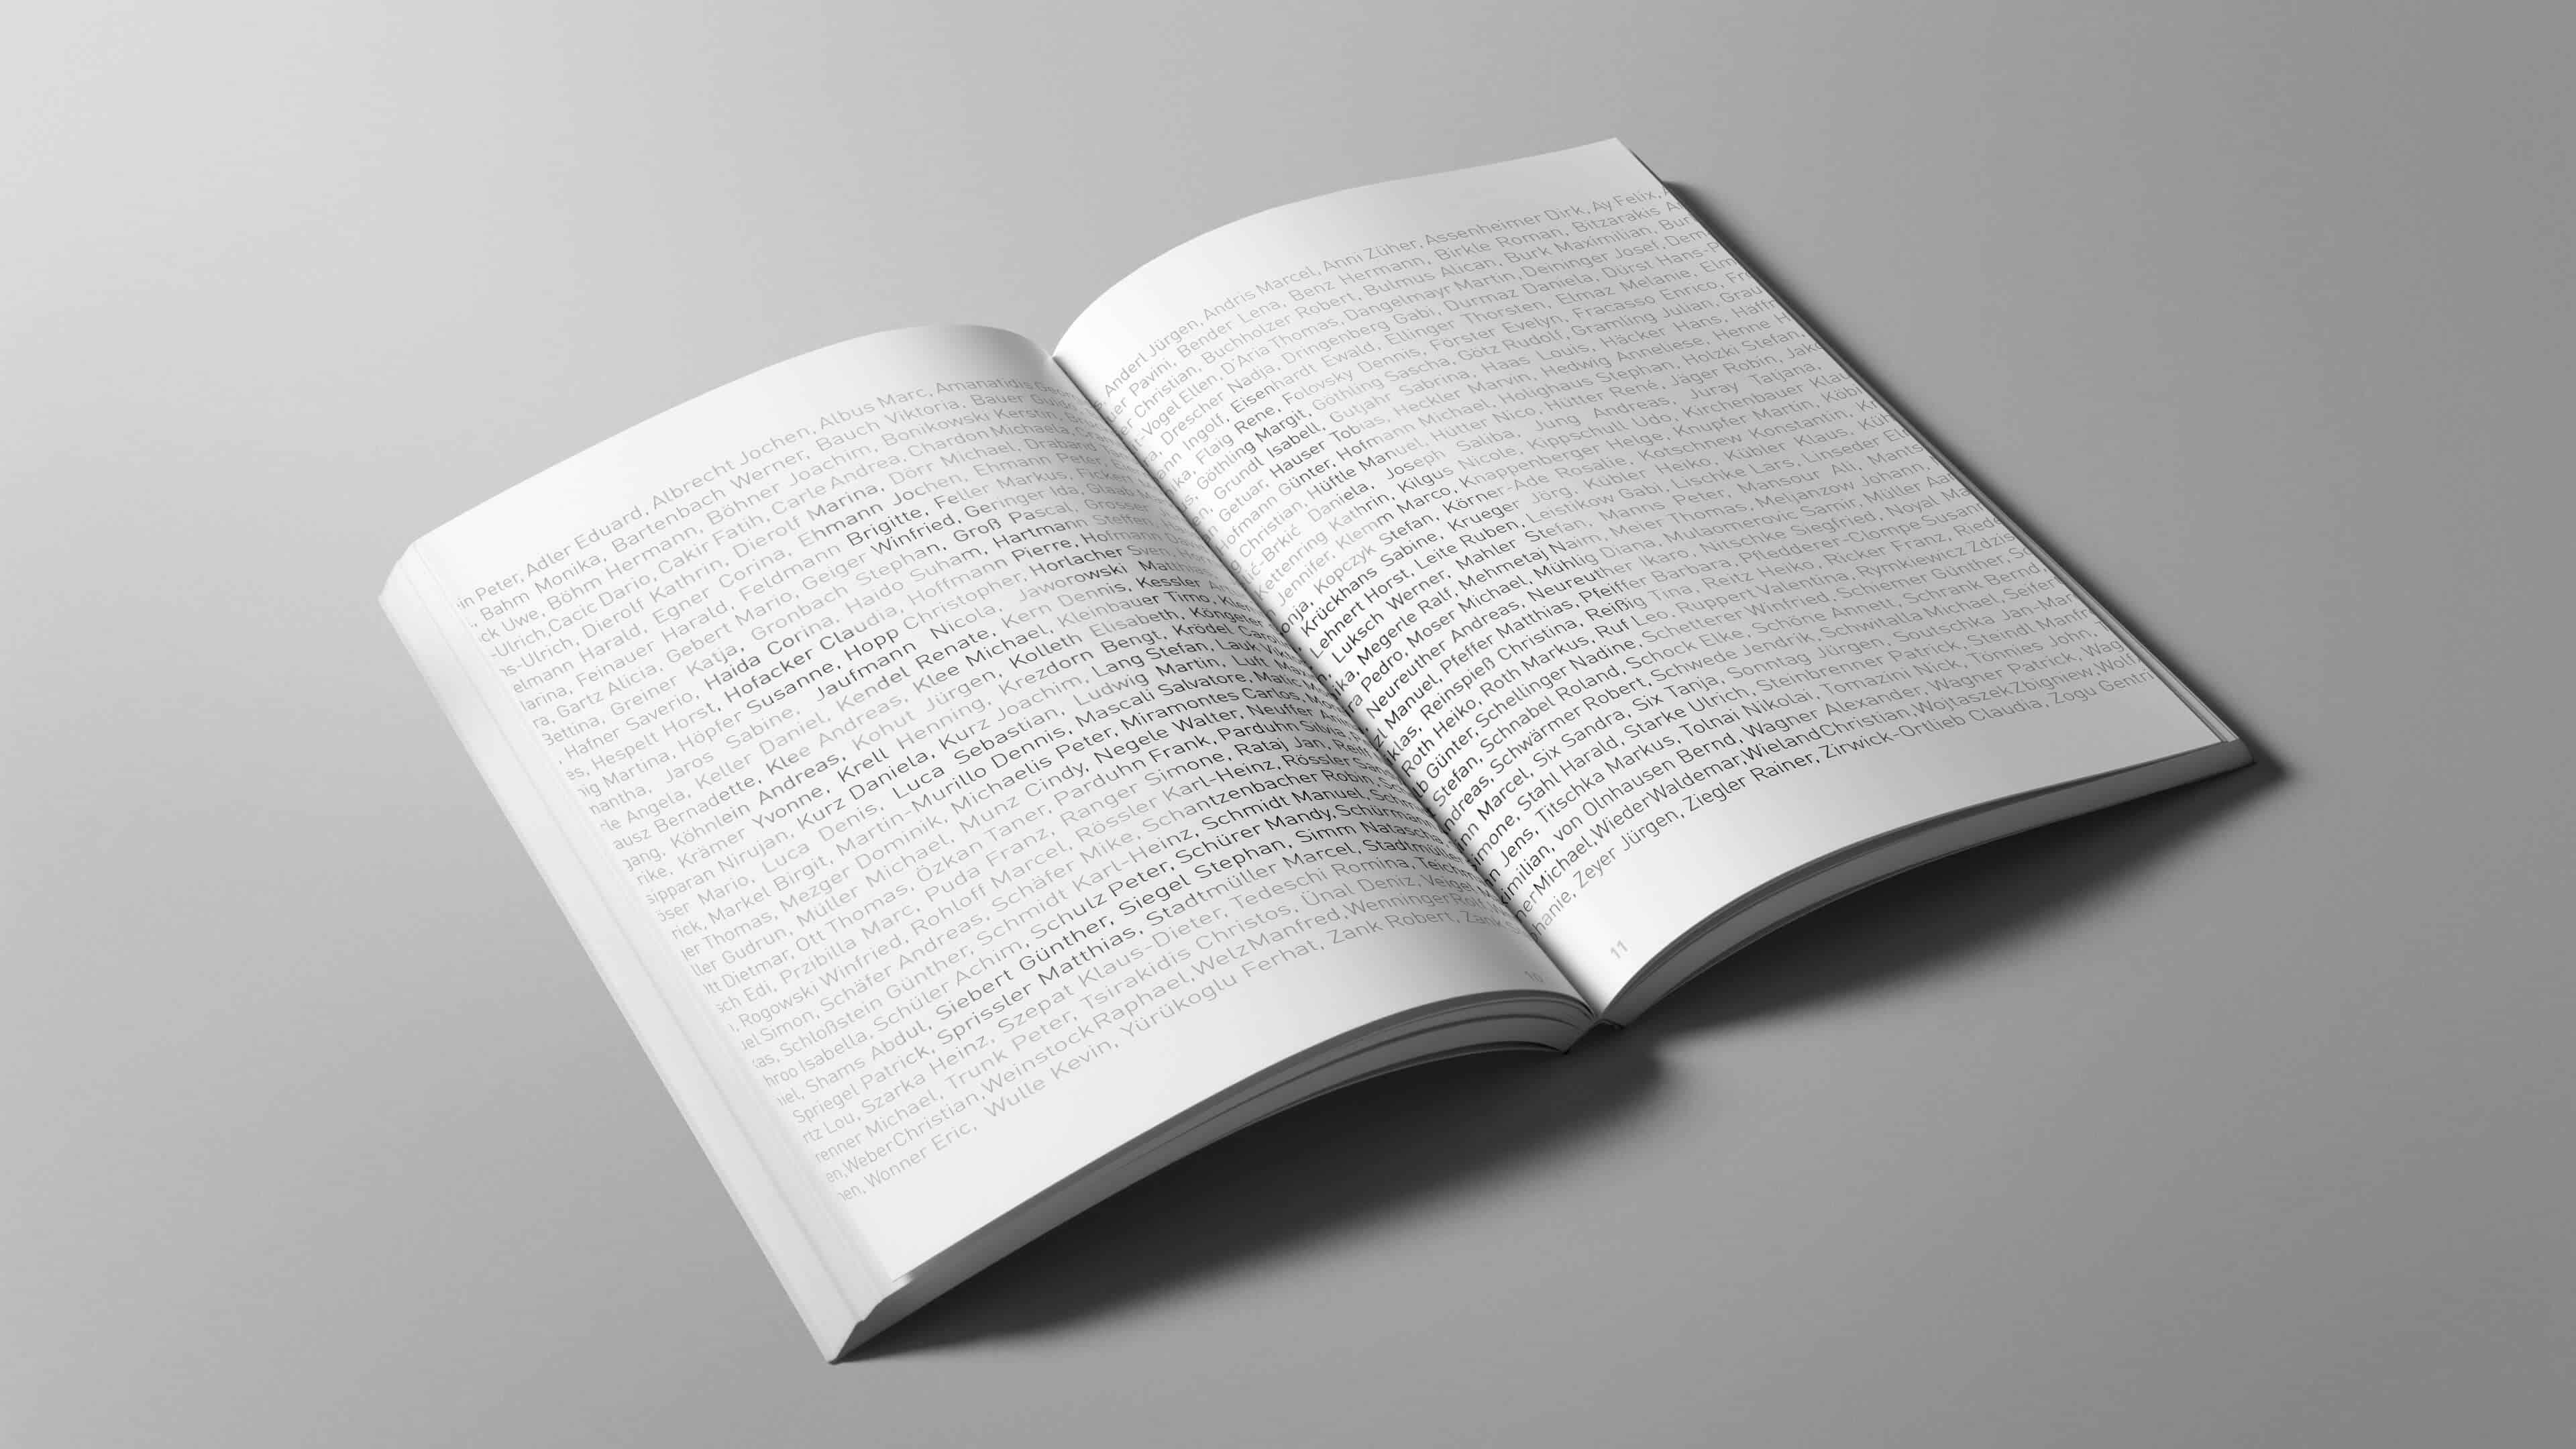 ASSMU-Kulturbuch-Innenseite1